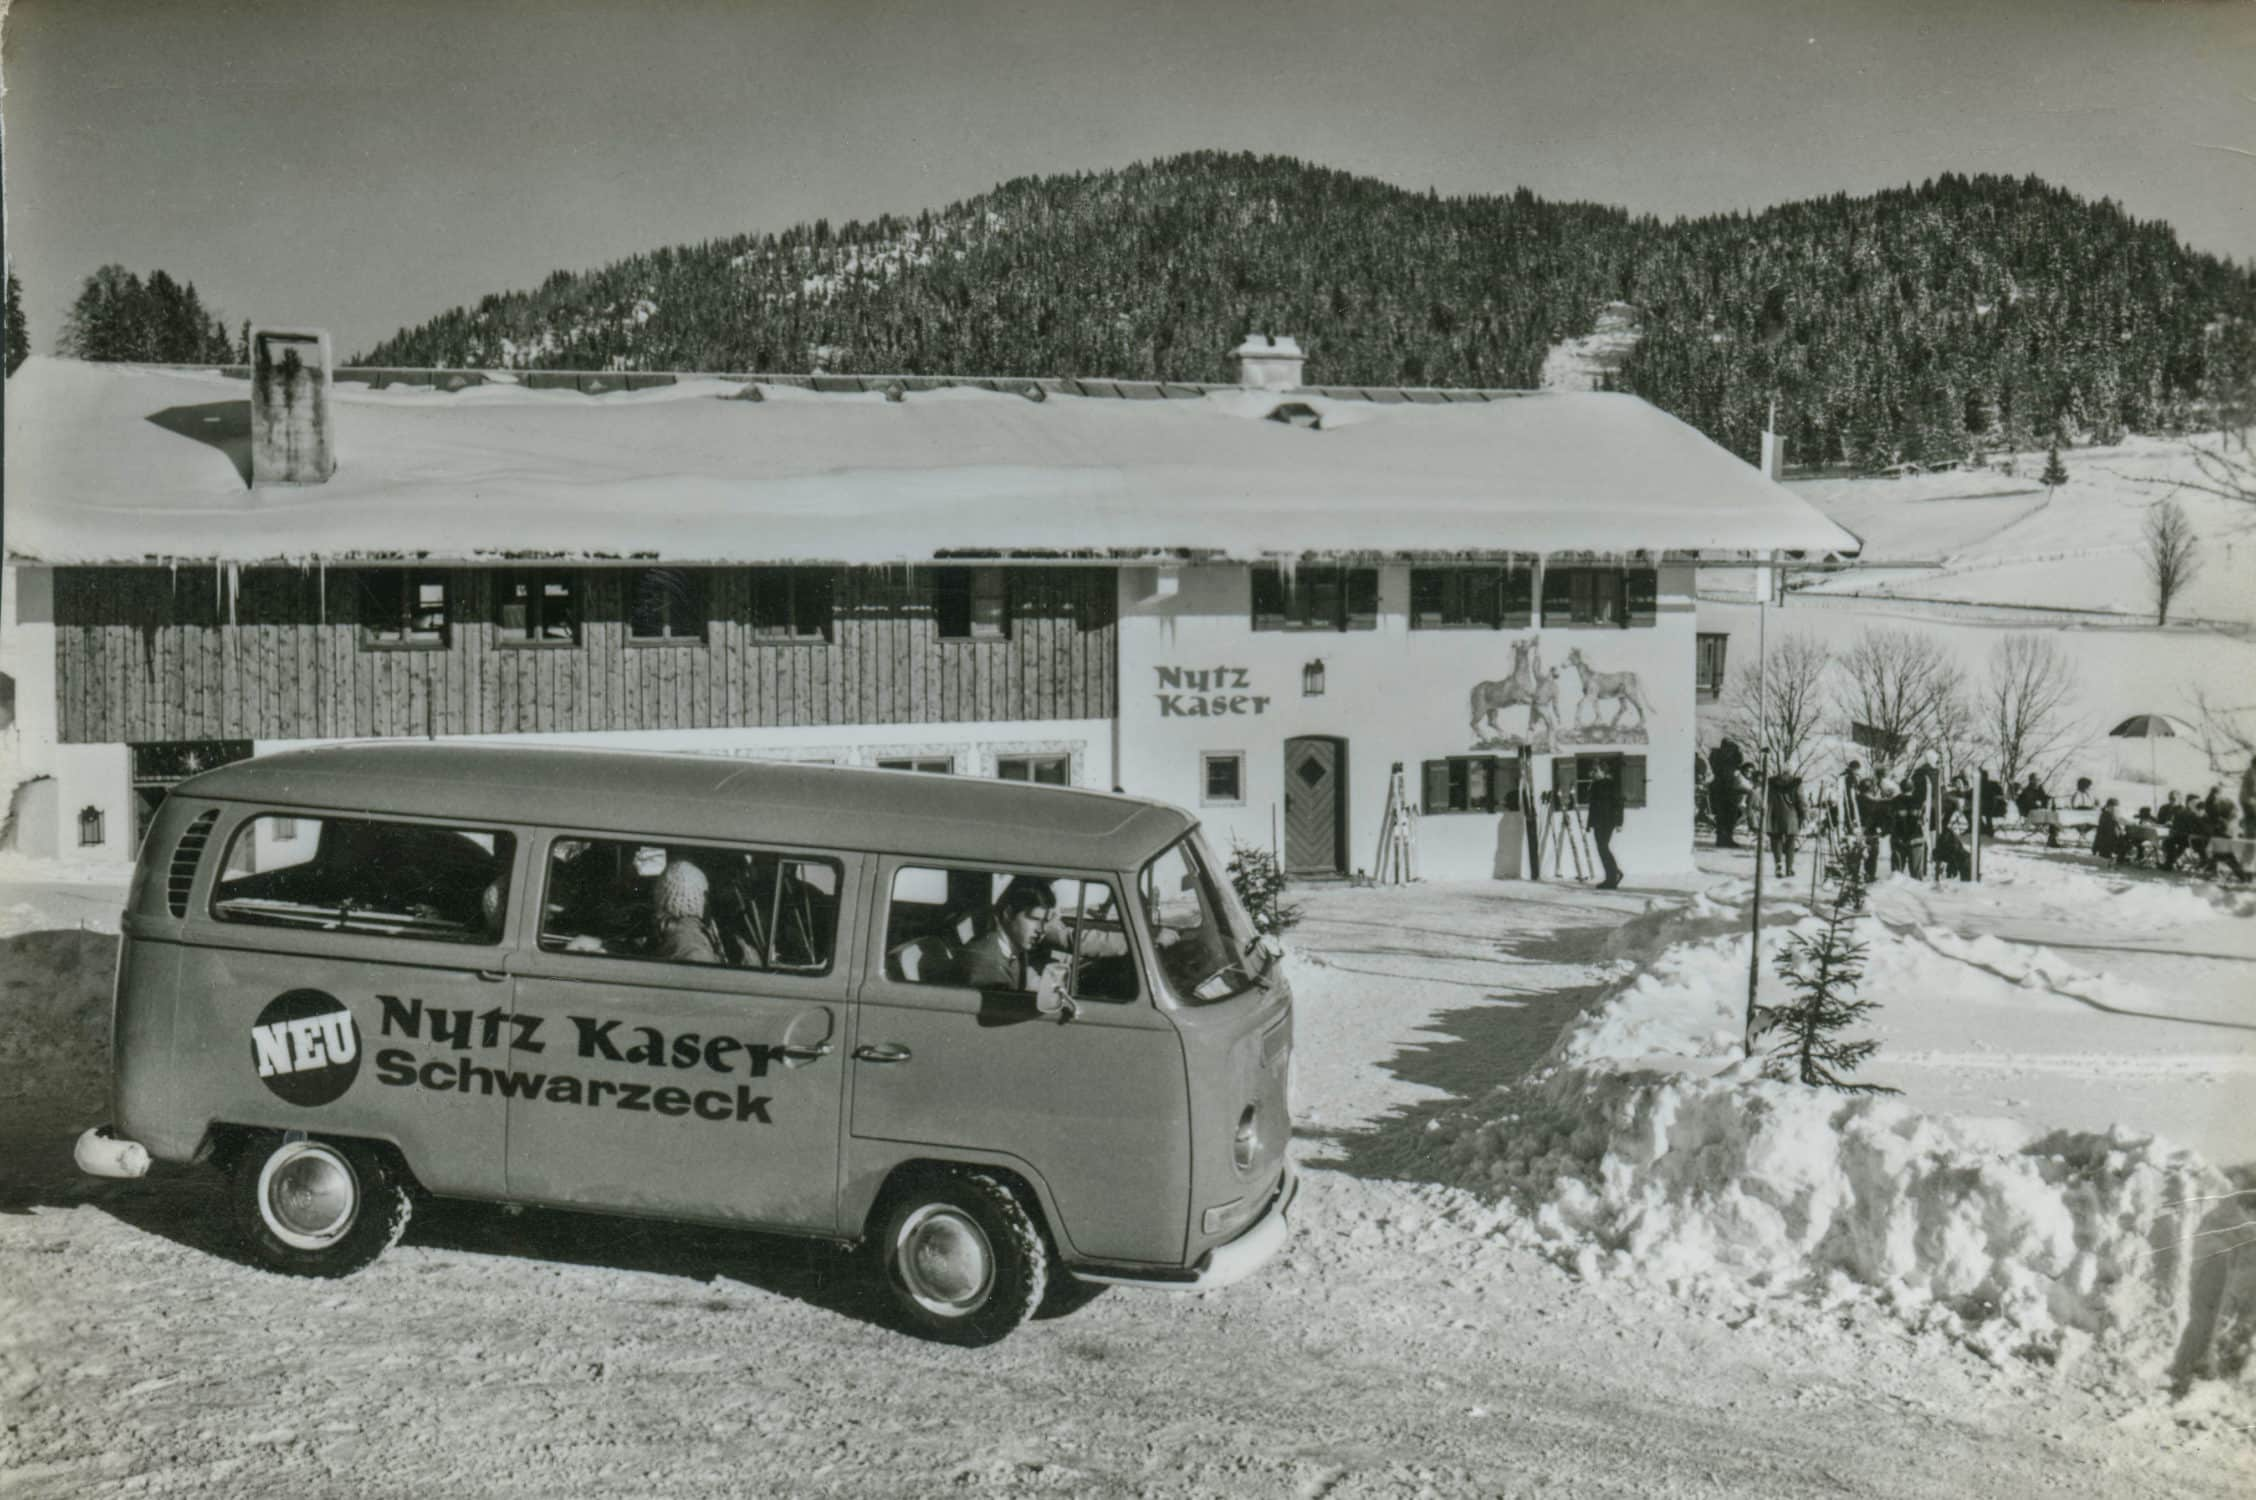 Hotel Gasthof Nutzkaser - Archivaufnahme